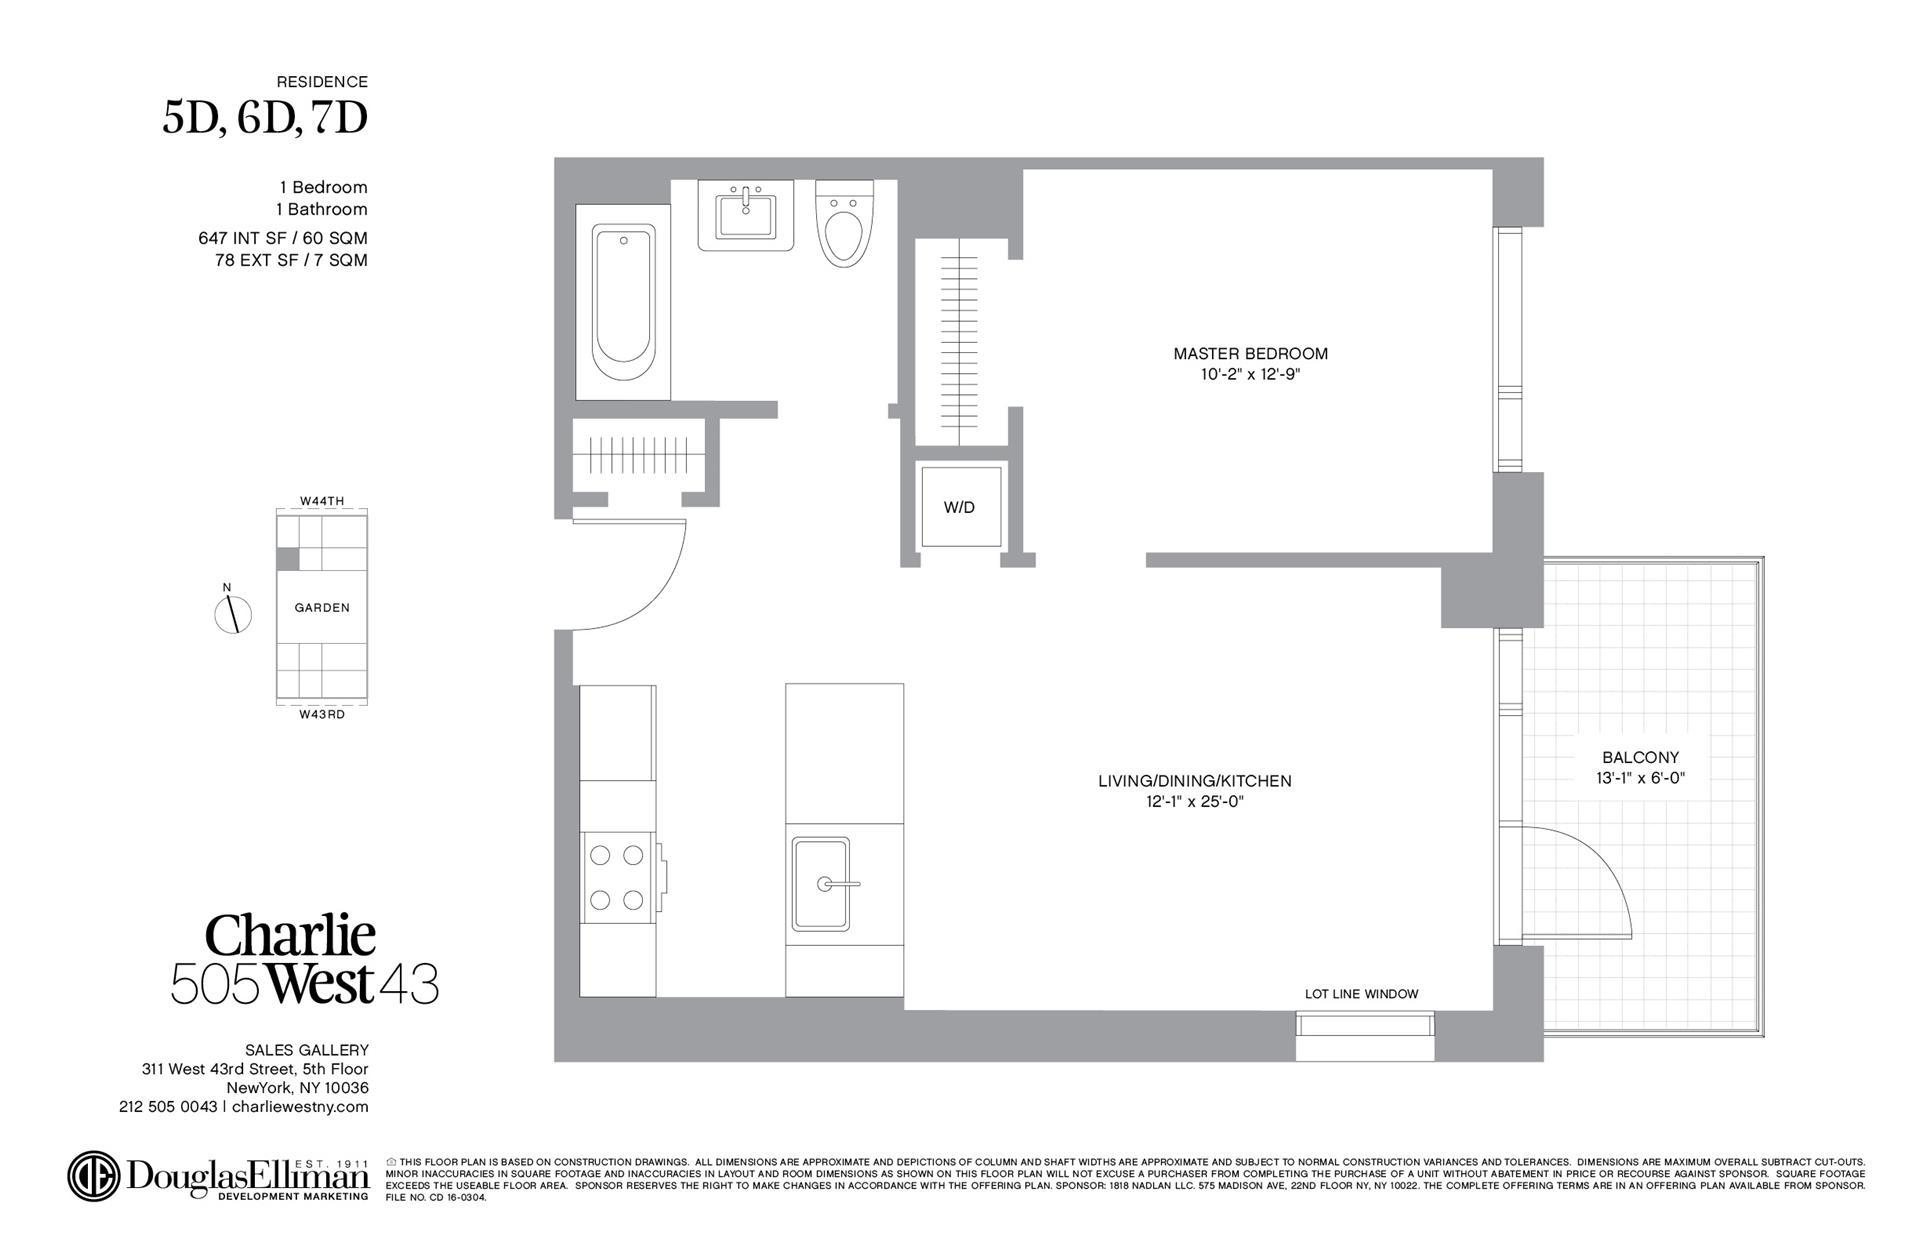 Floor plan of 505 West 43rd Street, 6D - Clinton, New York